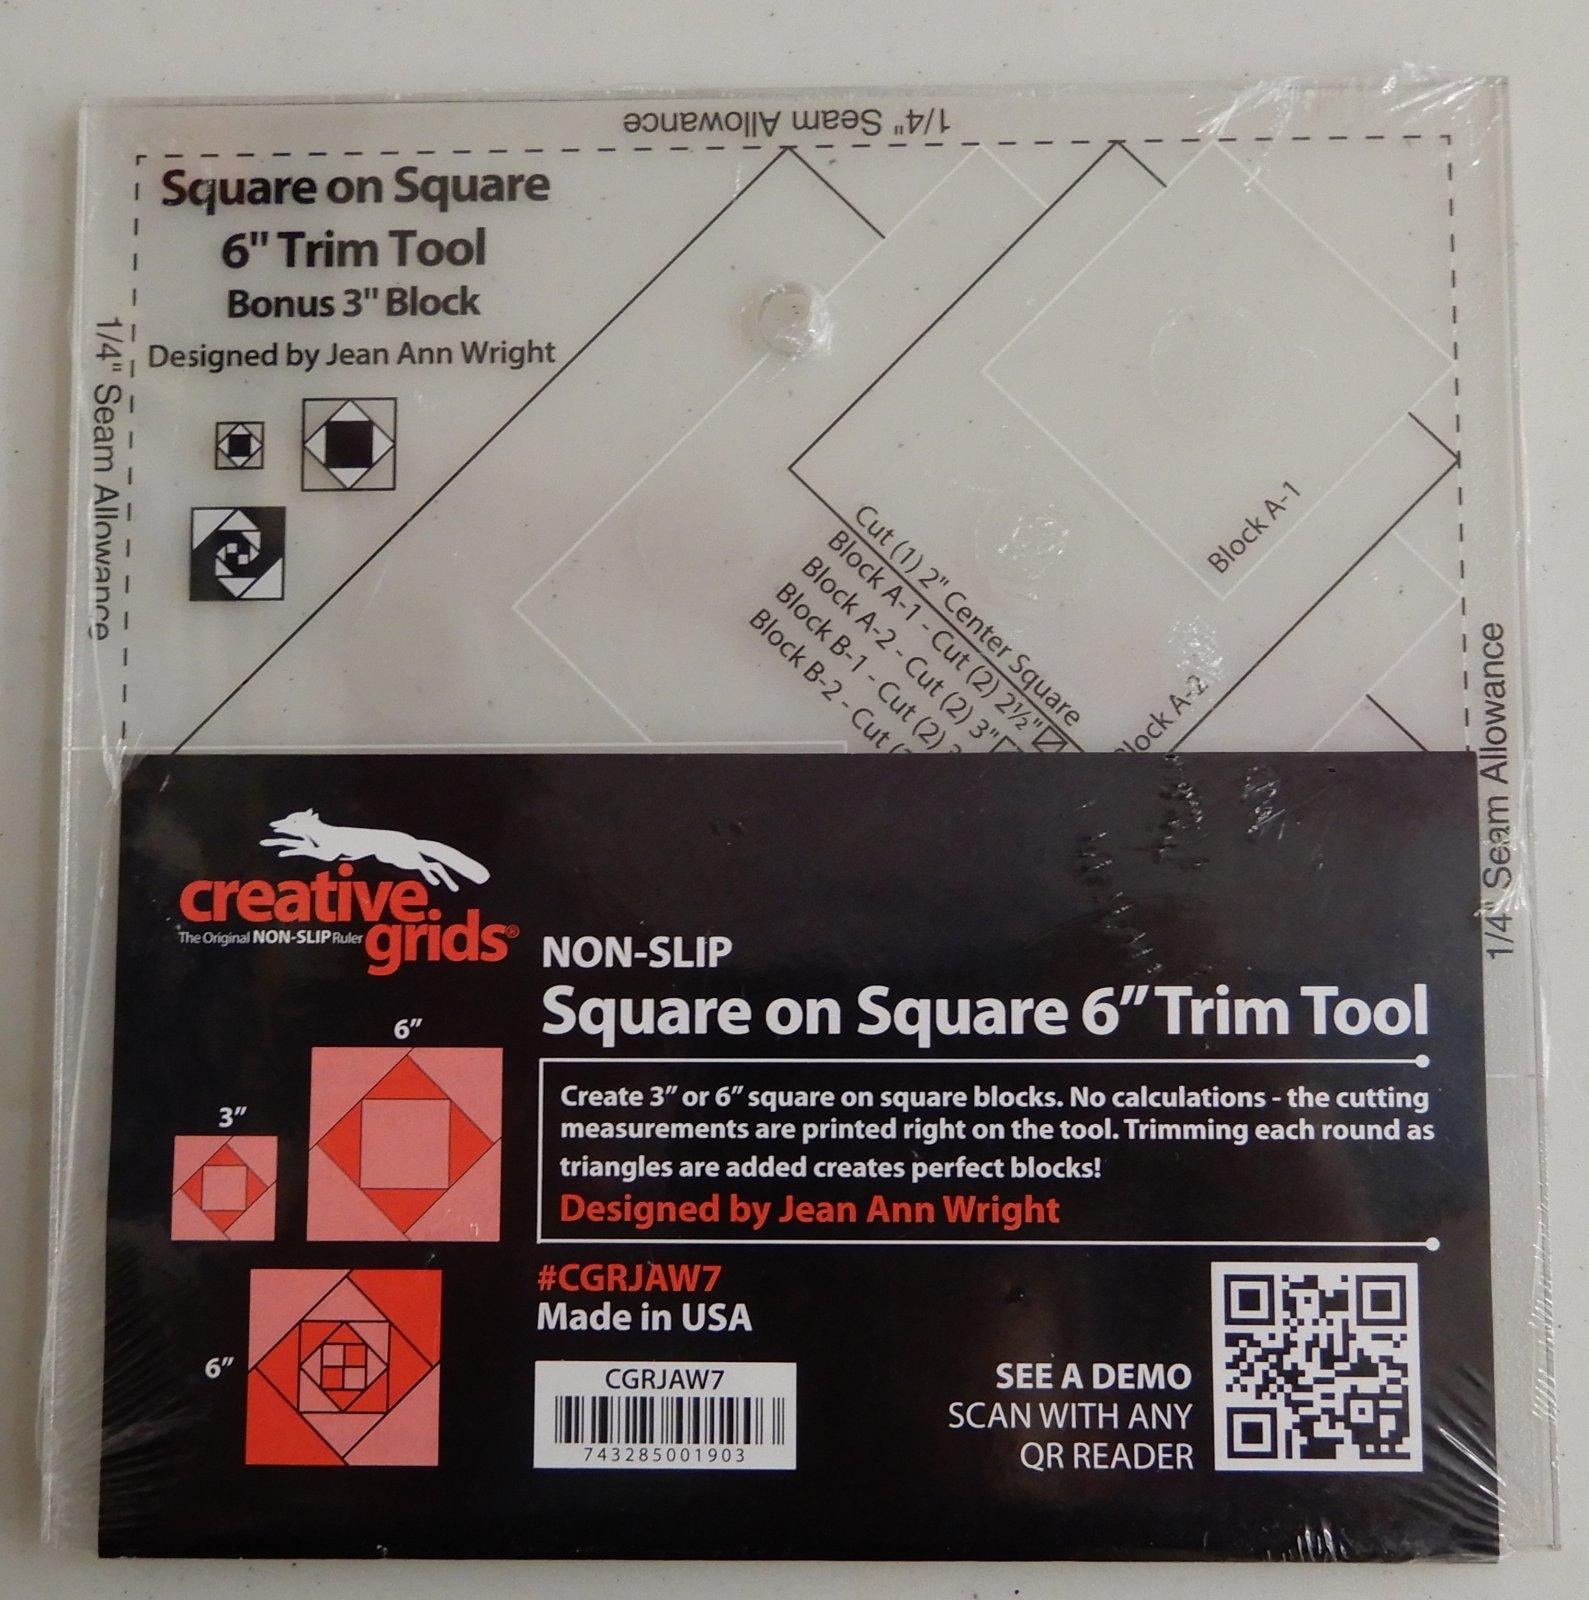 Creative Grids 6 Square on Square Trim Tool